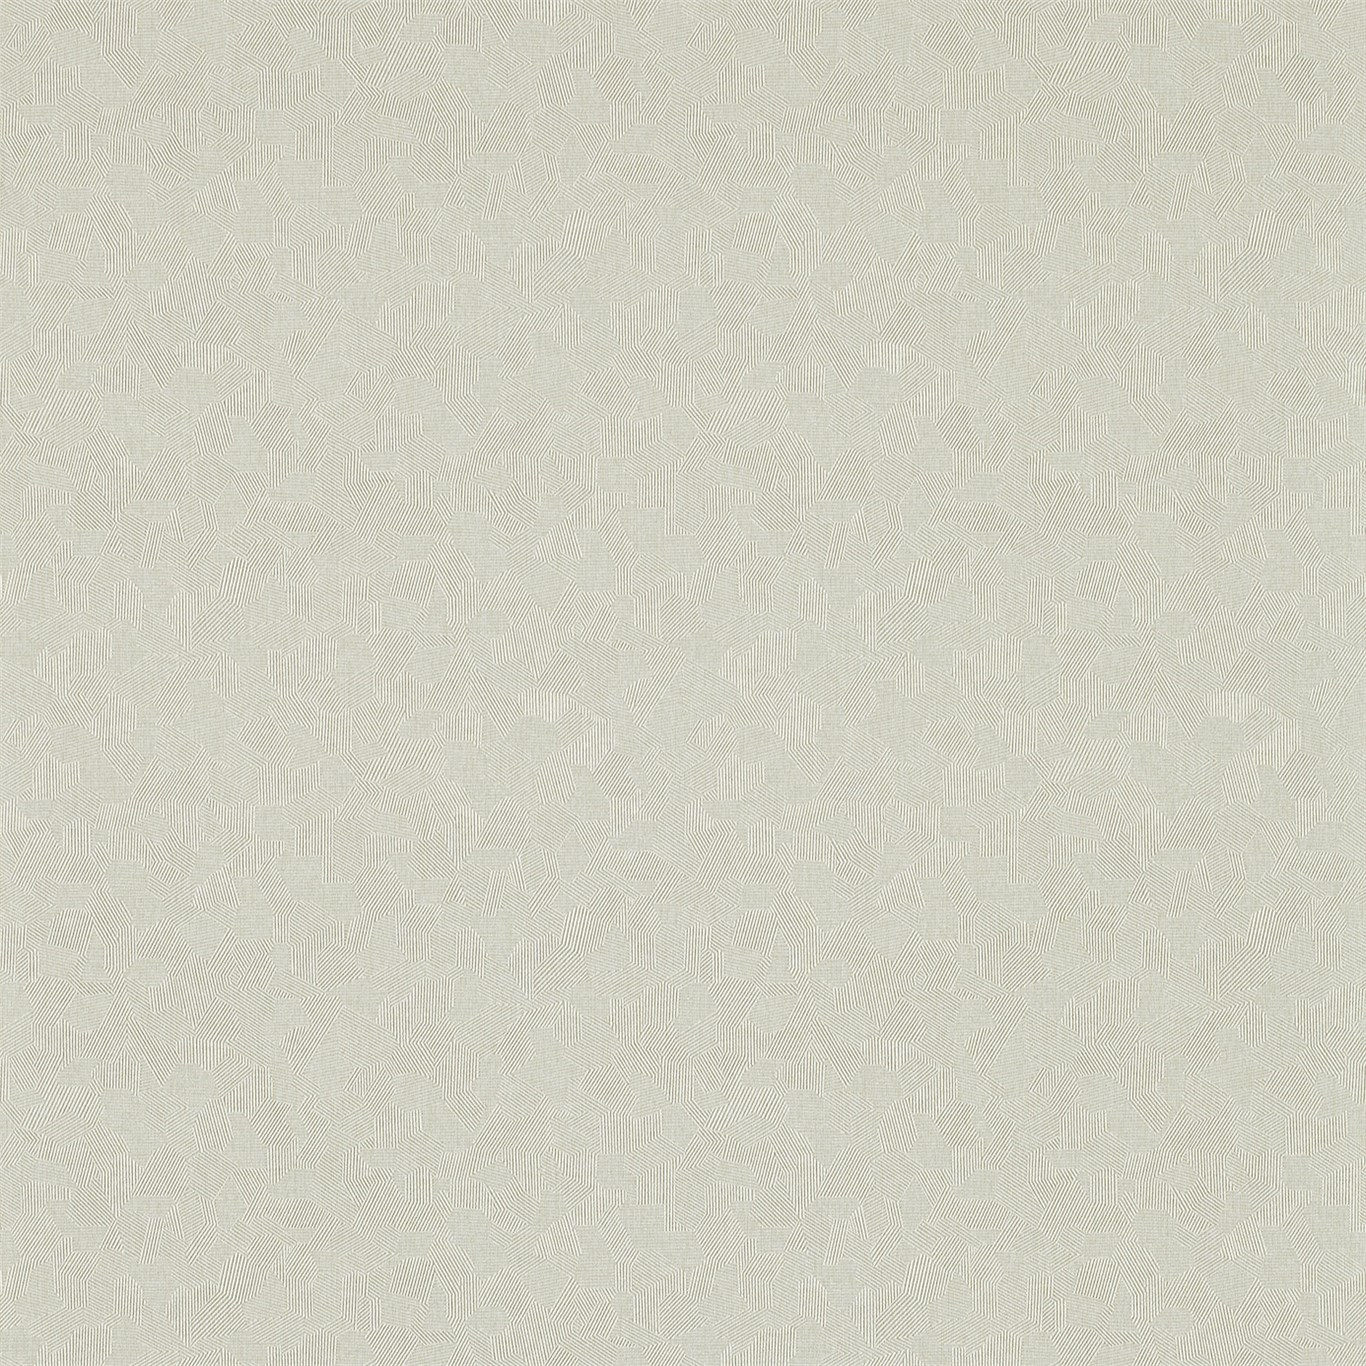 Английские обои Zoffany,  коллекция Prism Vinyls, артикул311772